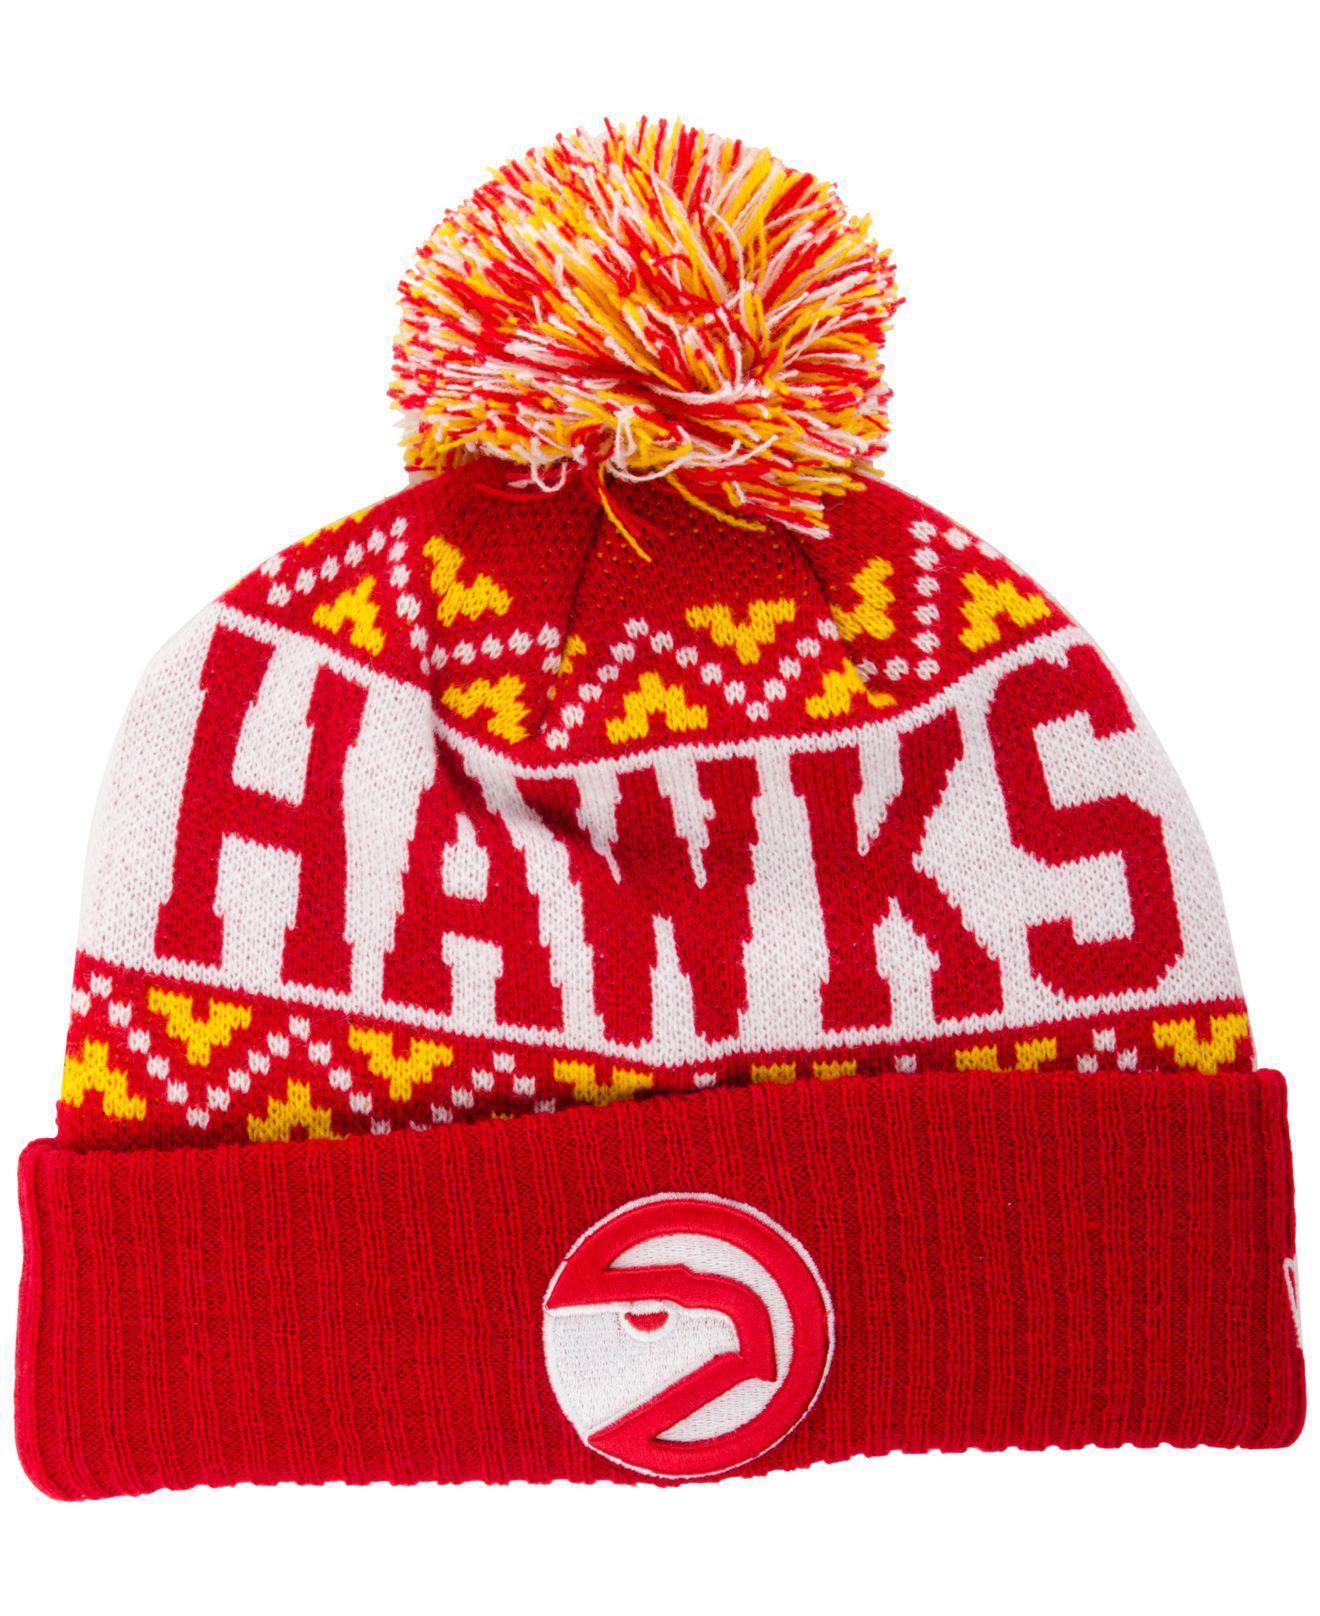 cc64e3abd4a99 ... reduced ktz. mens red atlanta hawks biggest christmas knit hat 6abf2  aeb94